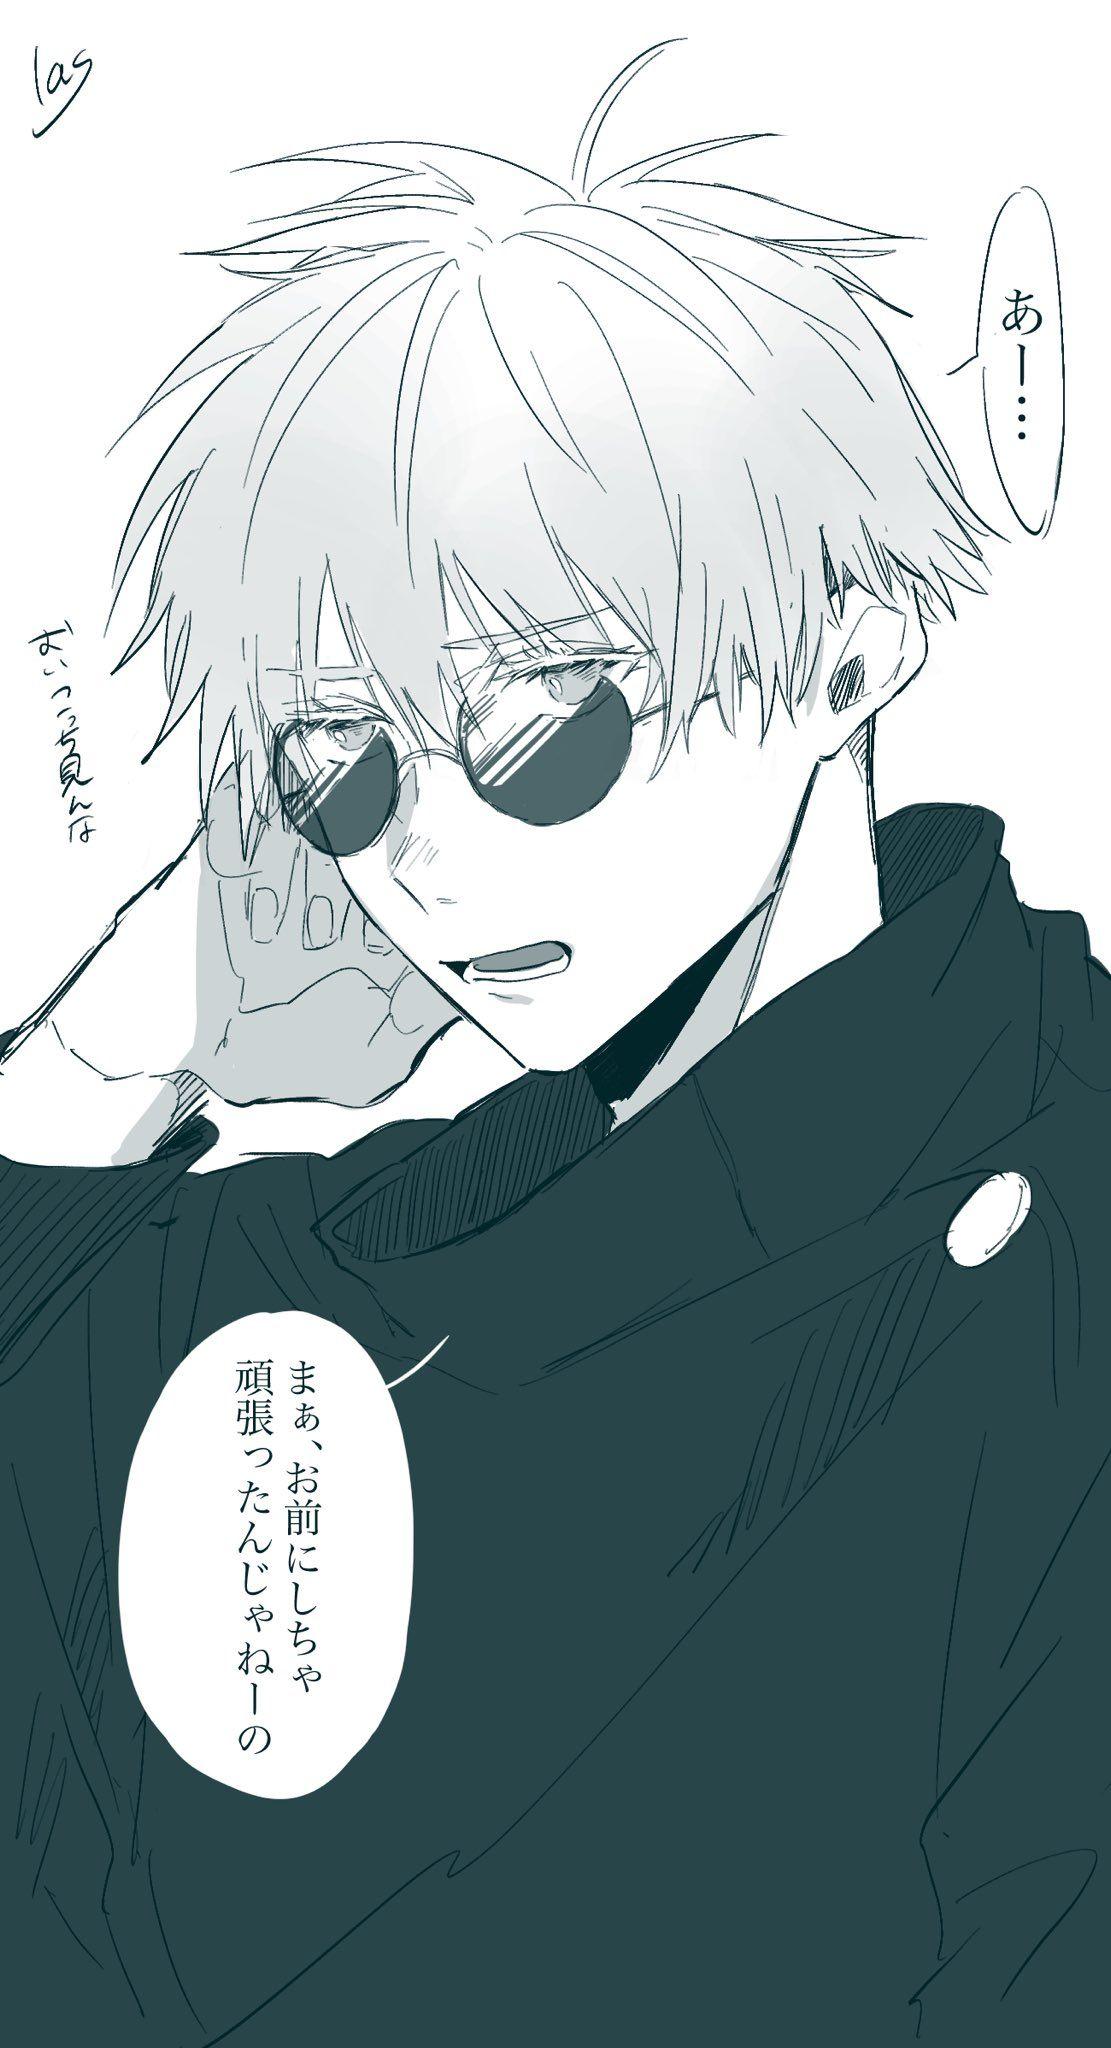 twitter bleach anime anime jujutsu